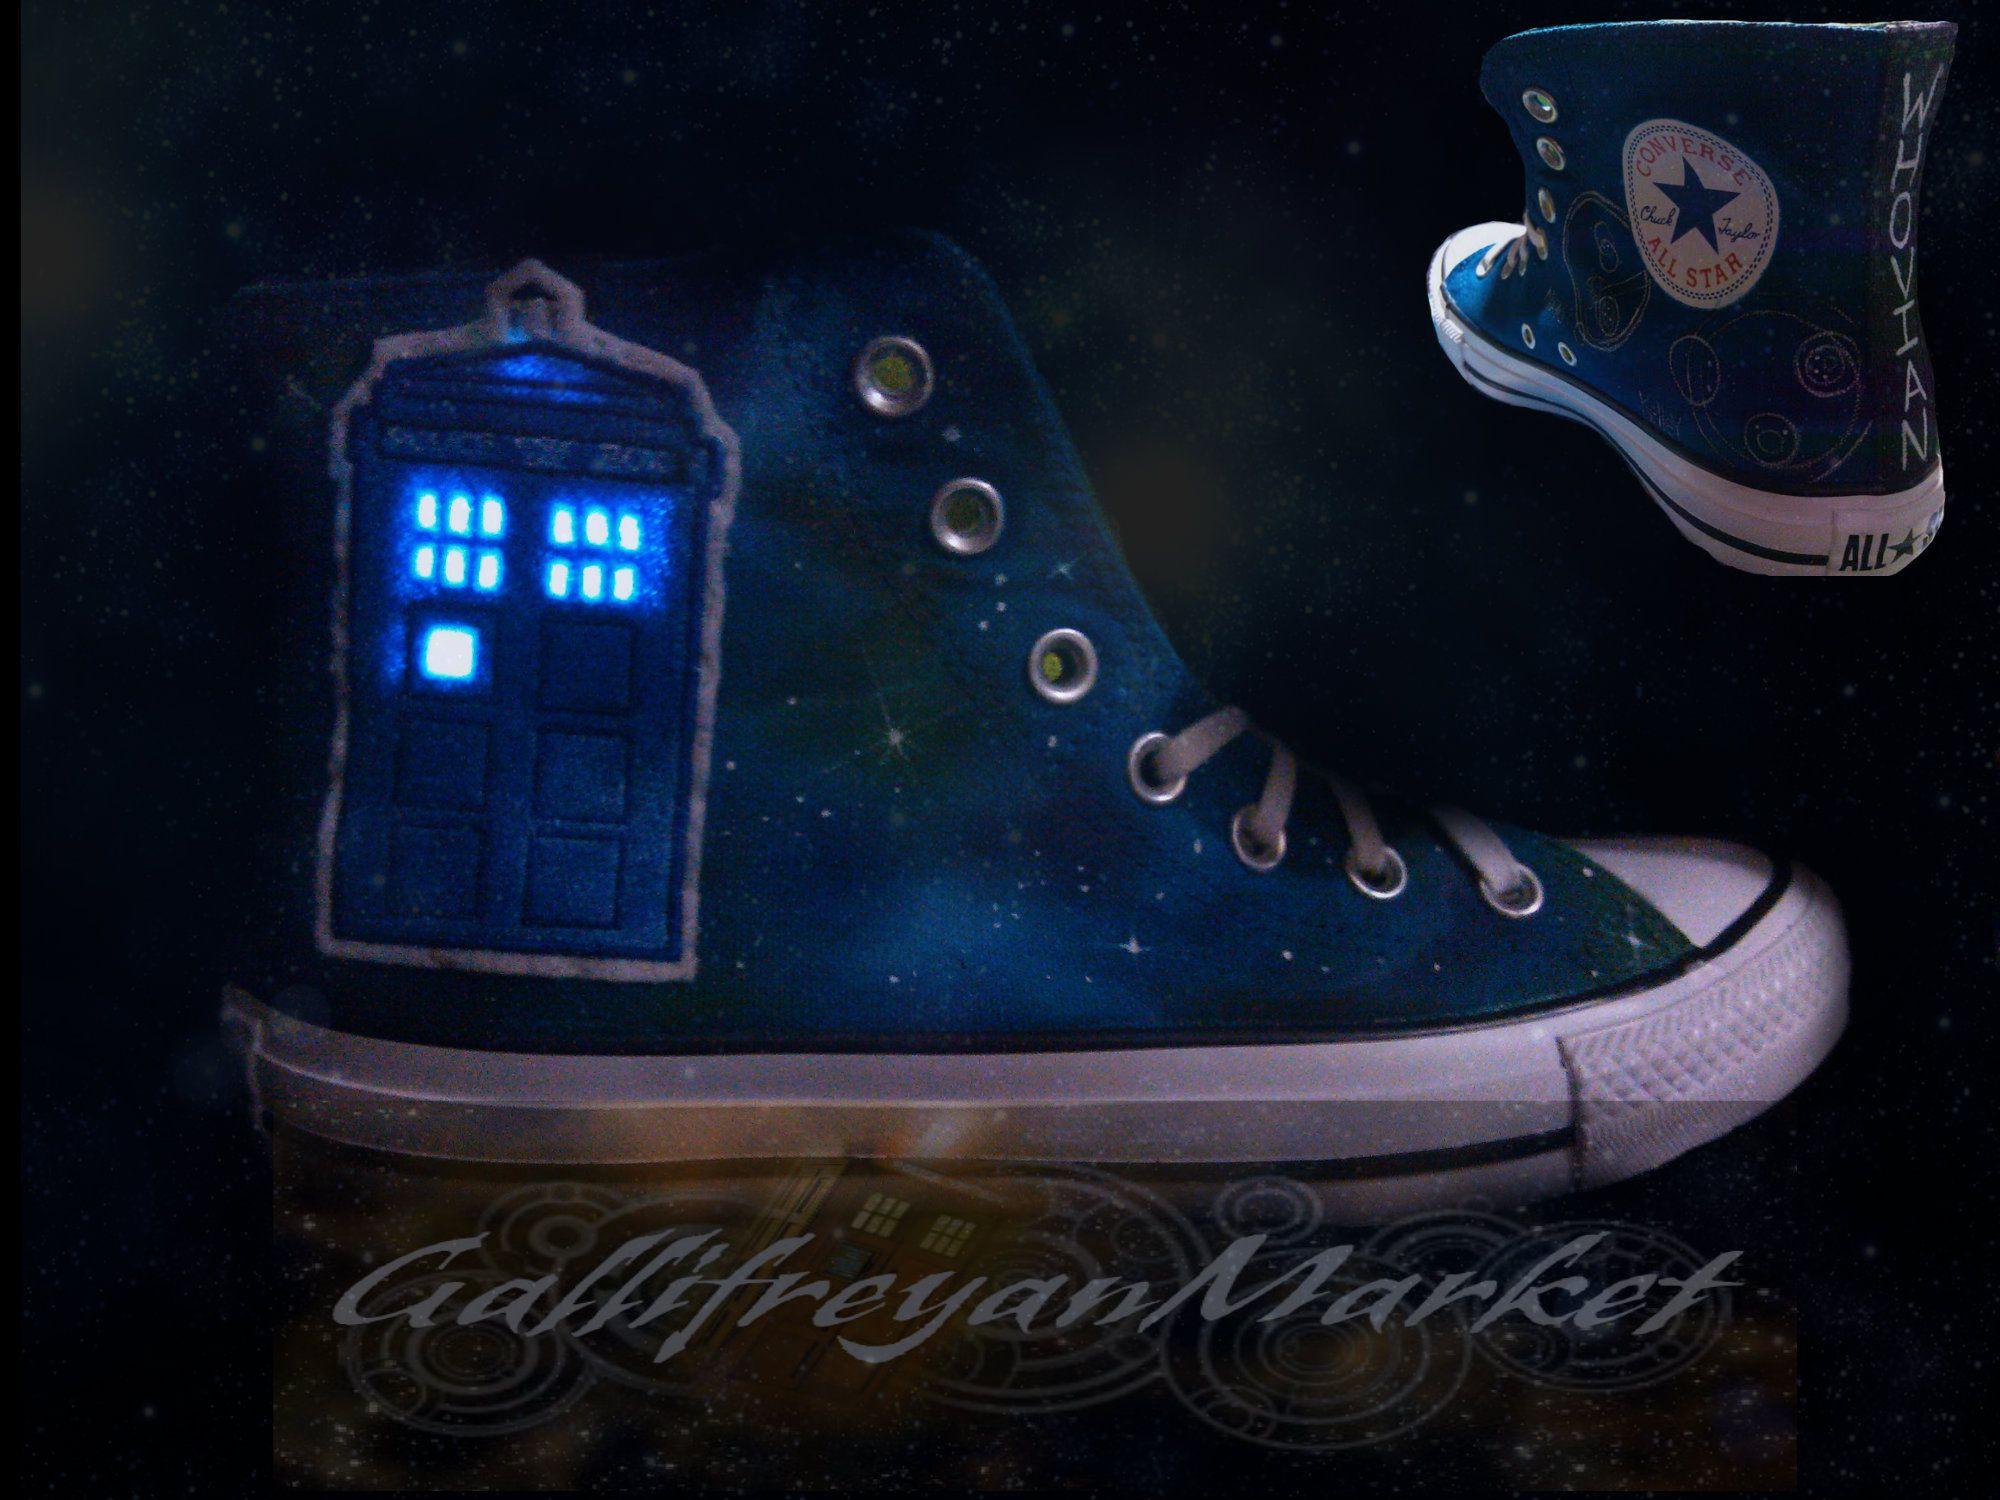 e2a9d3ec8c8f Light up TARDIS Converse!! Doctor Who Shoes!